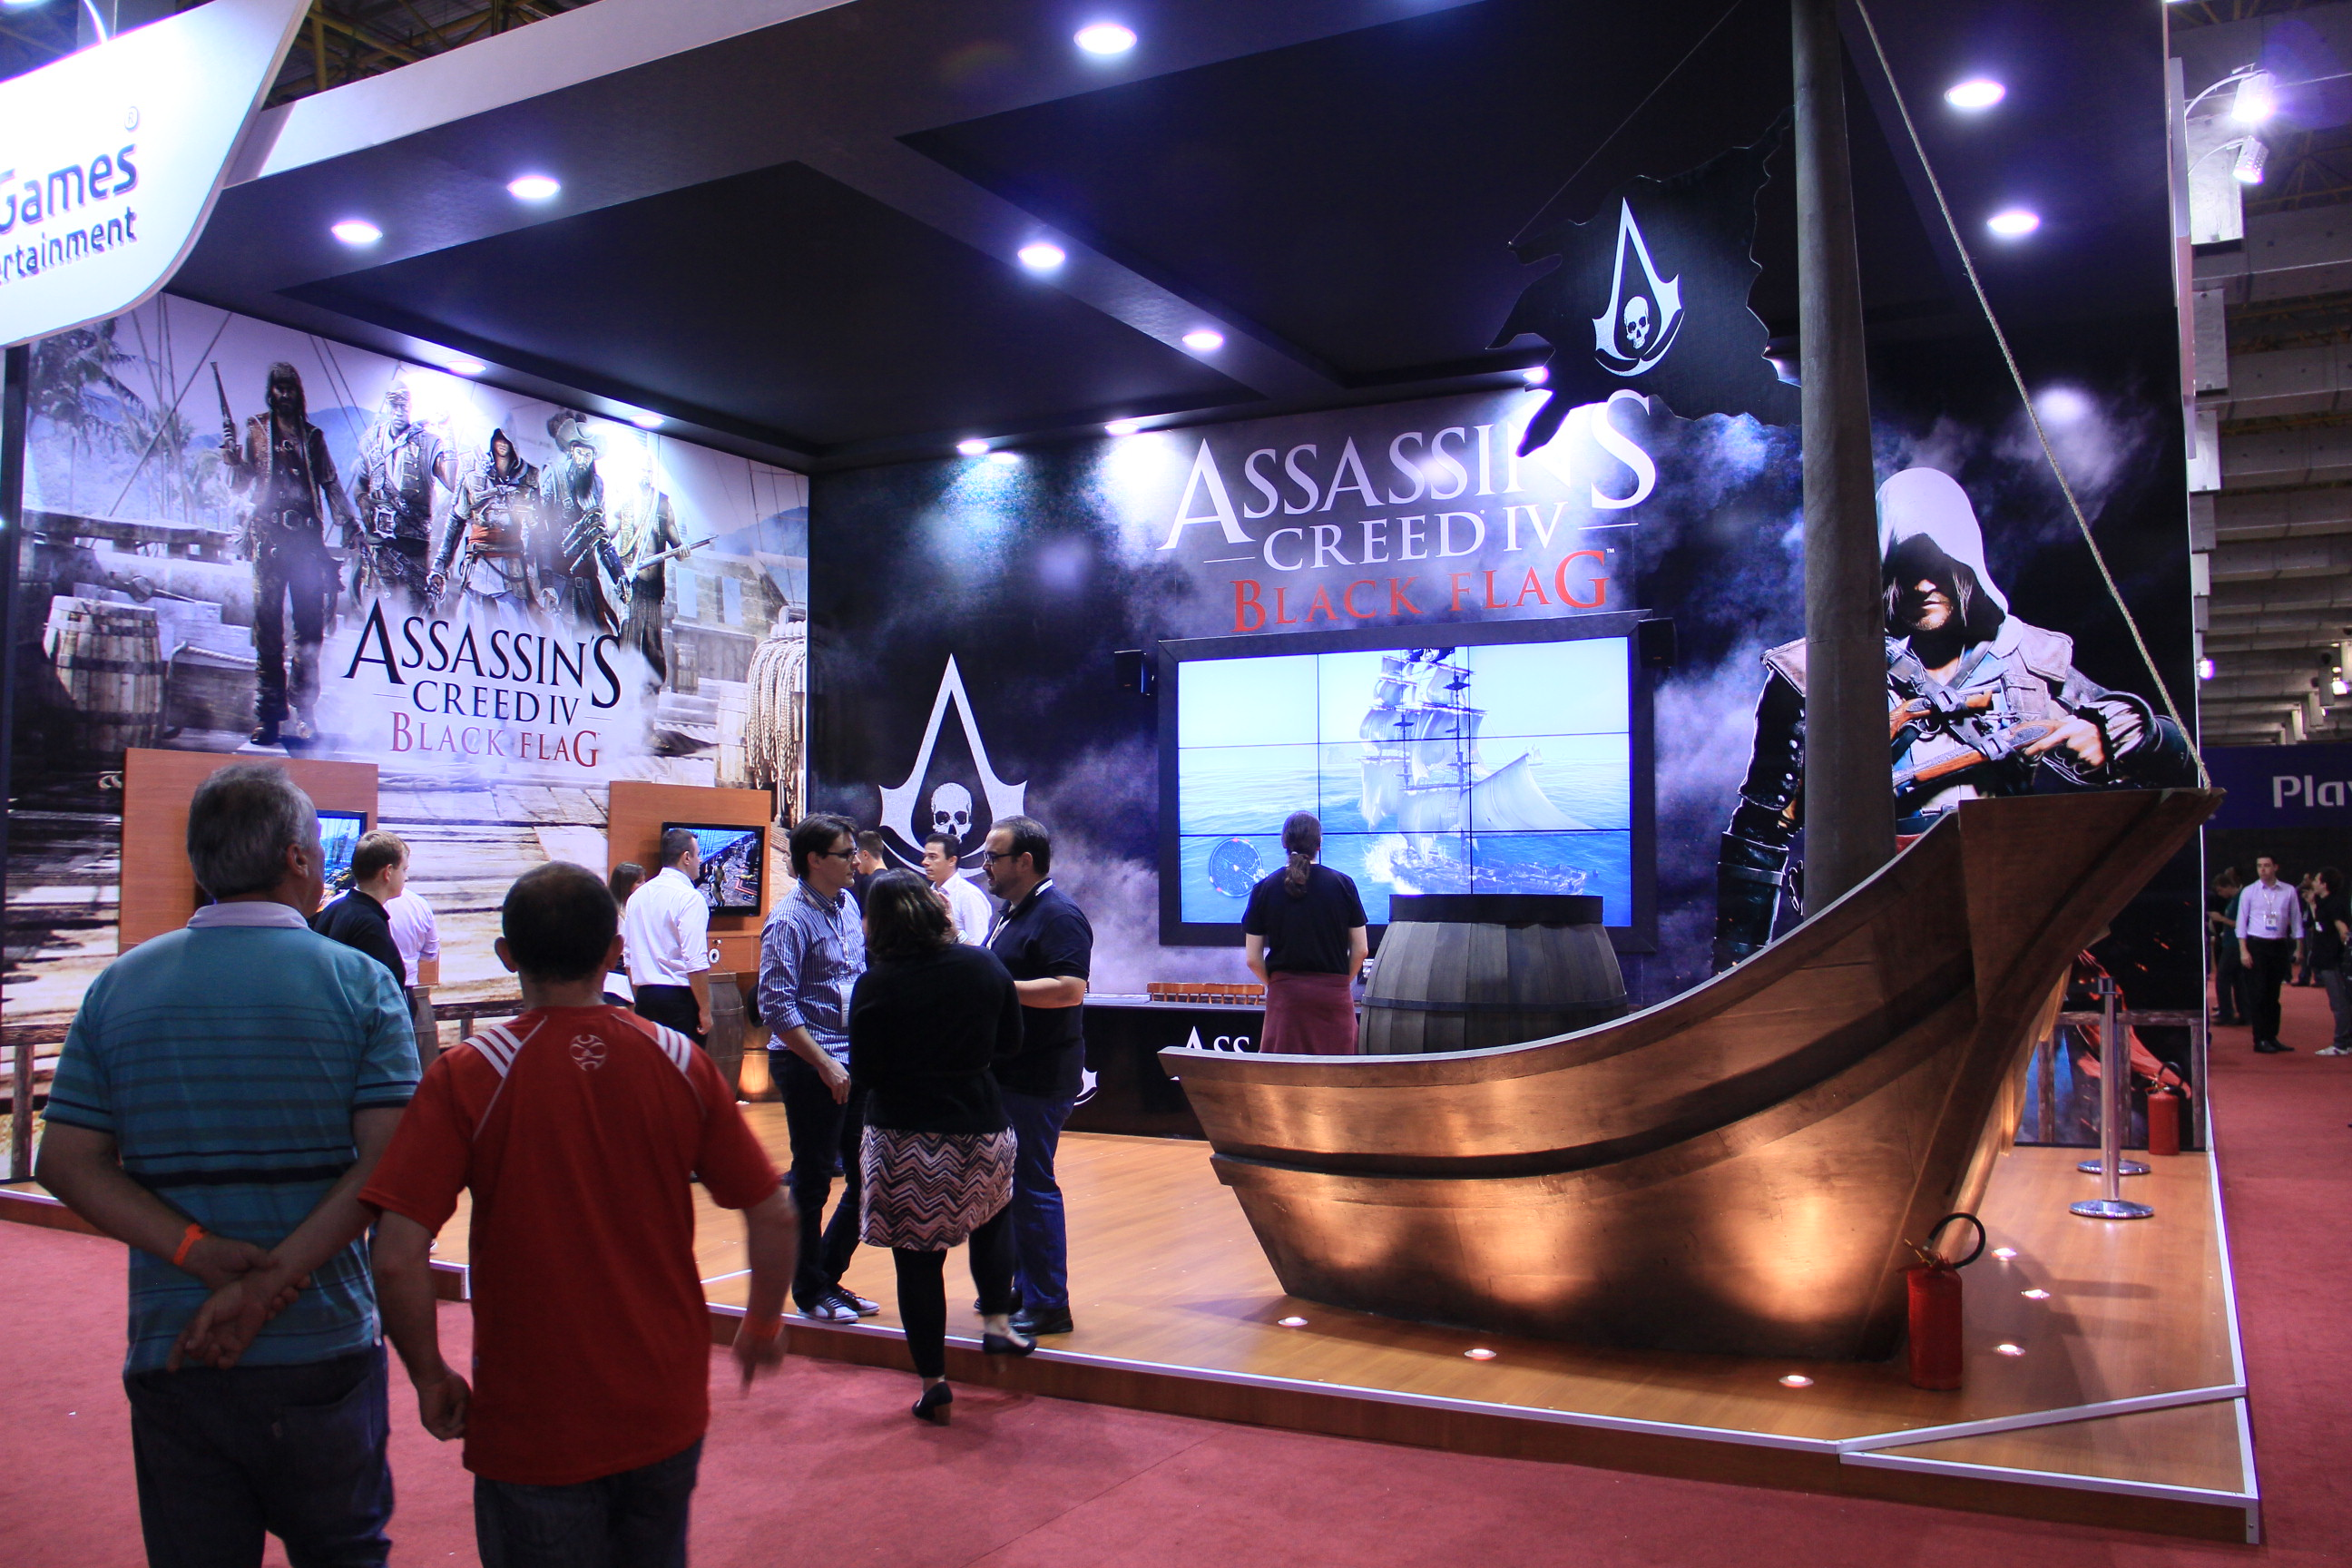 O estande de Assassin's Creed 4: Black Flag na BGS 2013 (Foto: Renato Bazan / TechTudo)